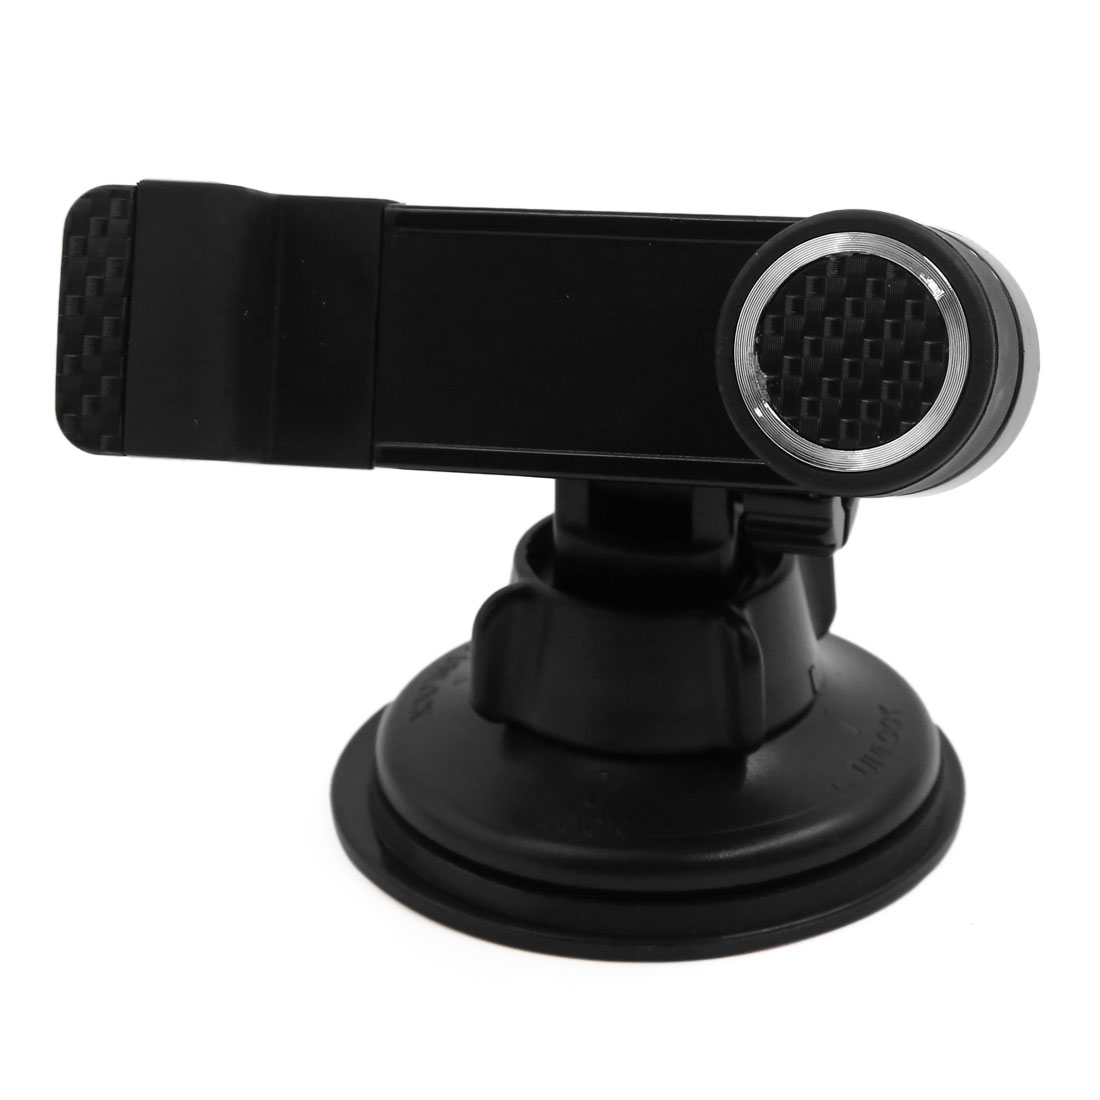 Universal Windshield Mount 360 Degree Swivel Mobile Phone Adjustable Stand Holder